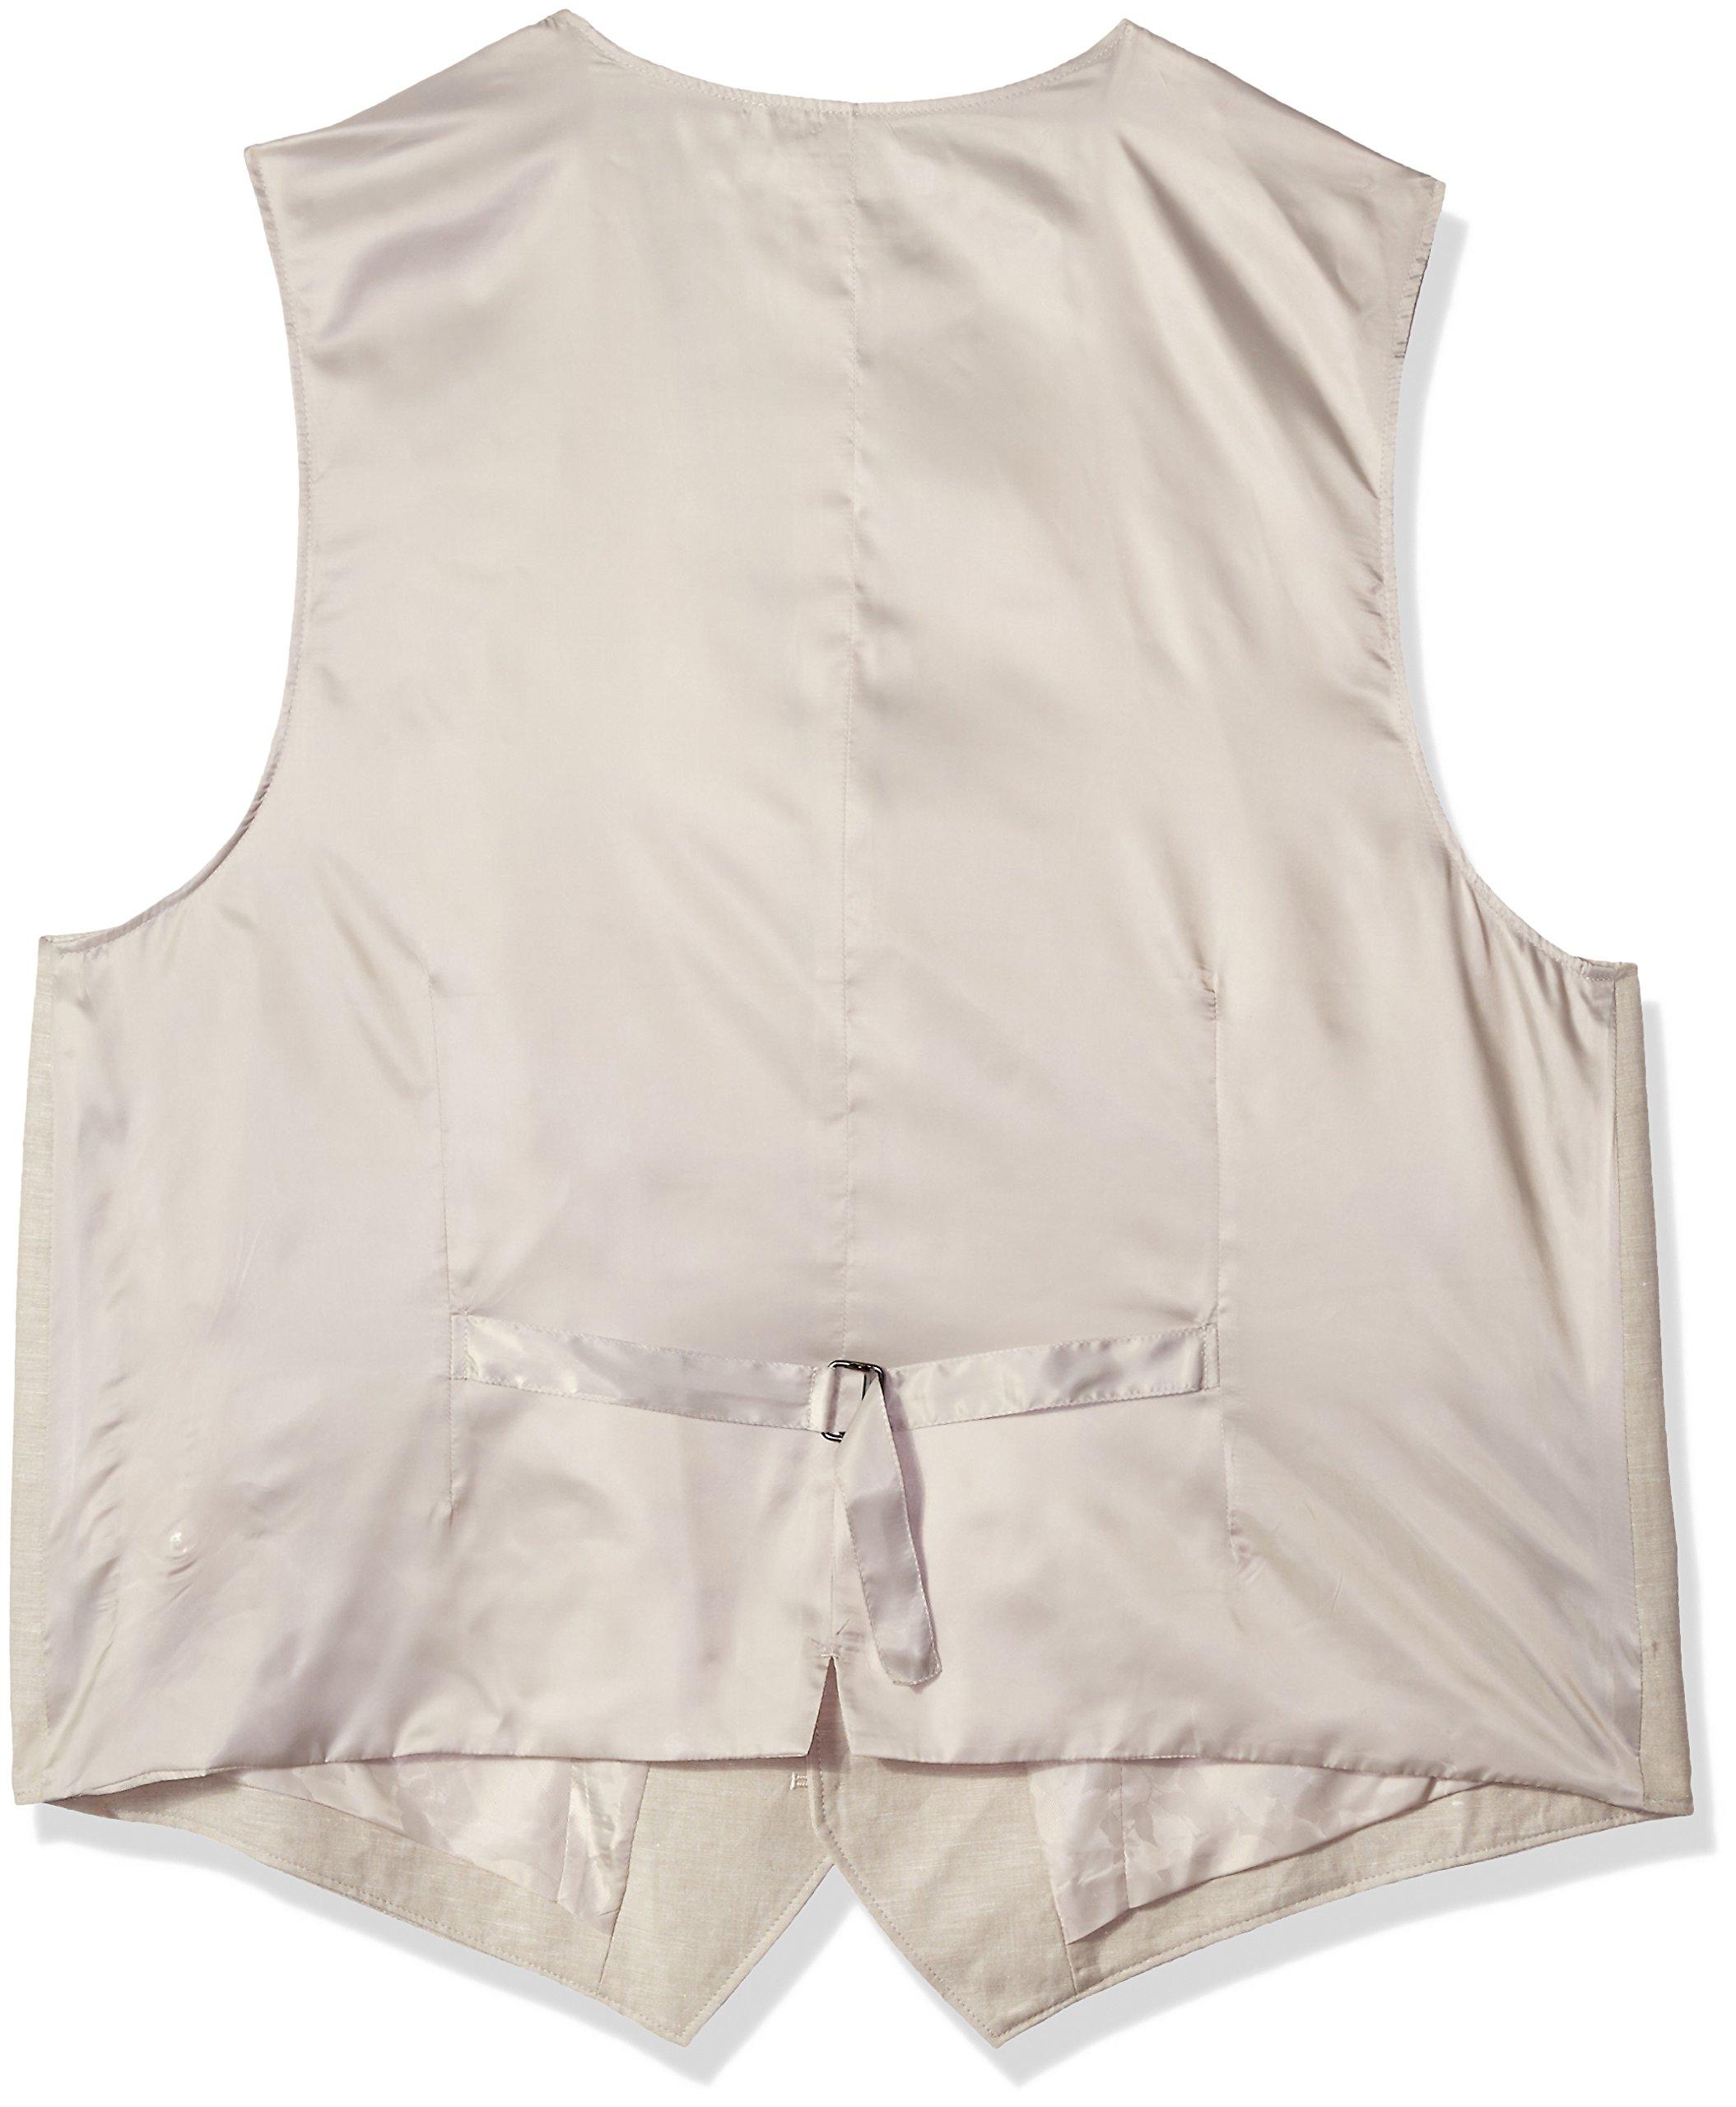 Cubavera Men's Big and Tall Easy Care Linen Blend Vest, Khaki, 3X by Cubavera (Image #2)